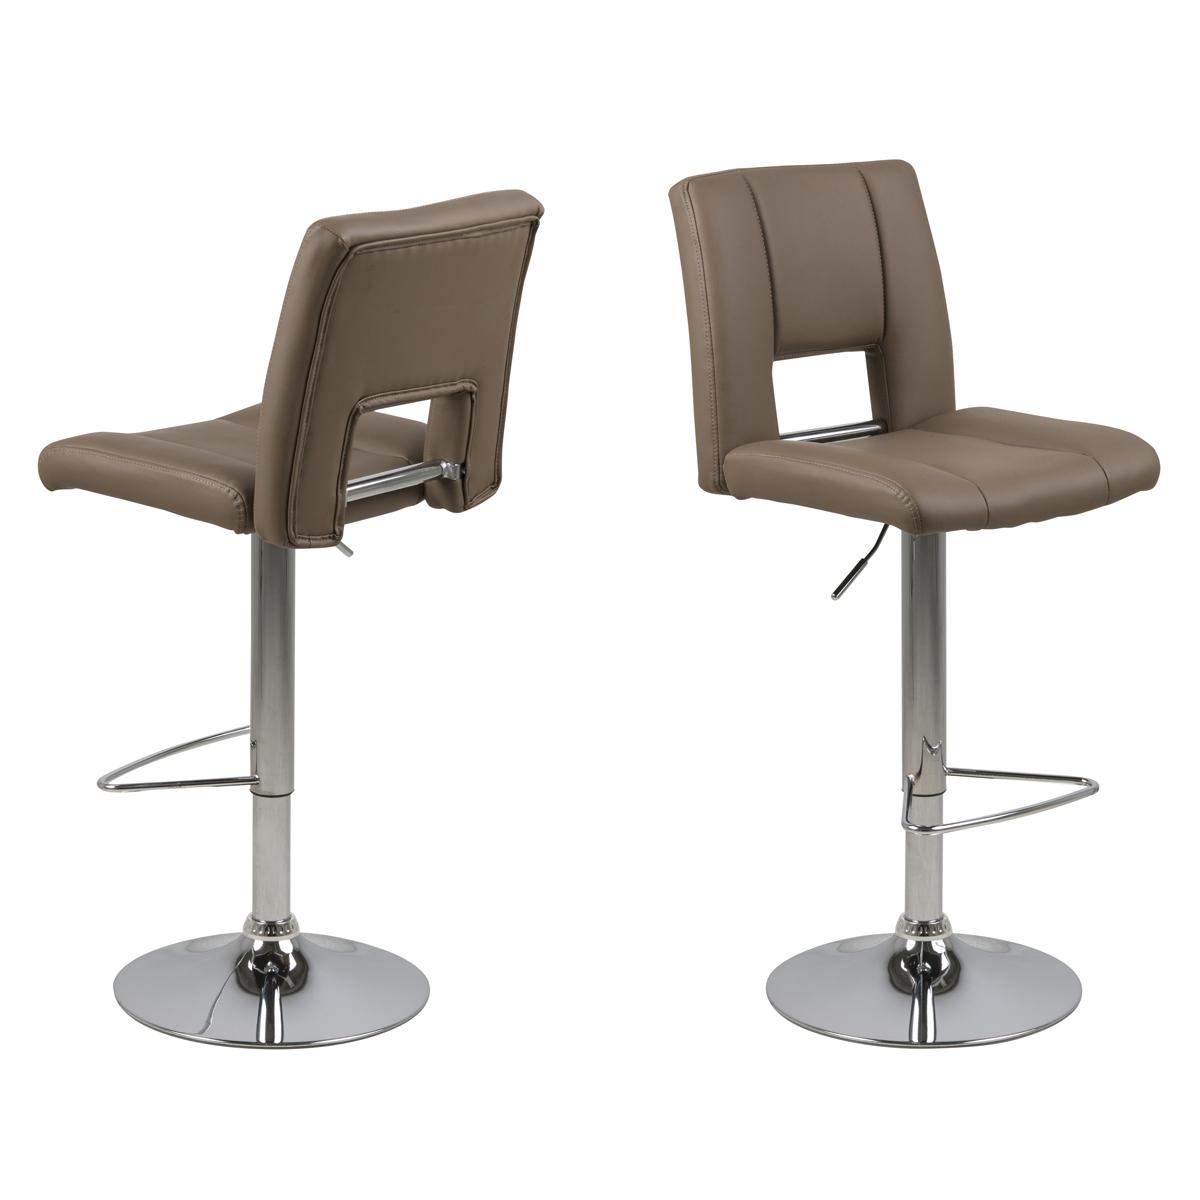 2er set barhocker sylvia in lederlook und chrom bar stuhl for Bar und hocker